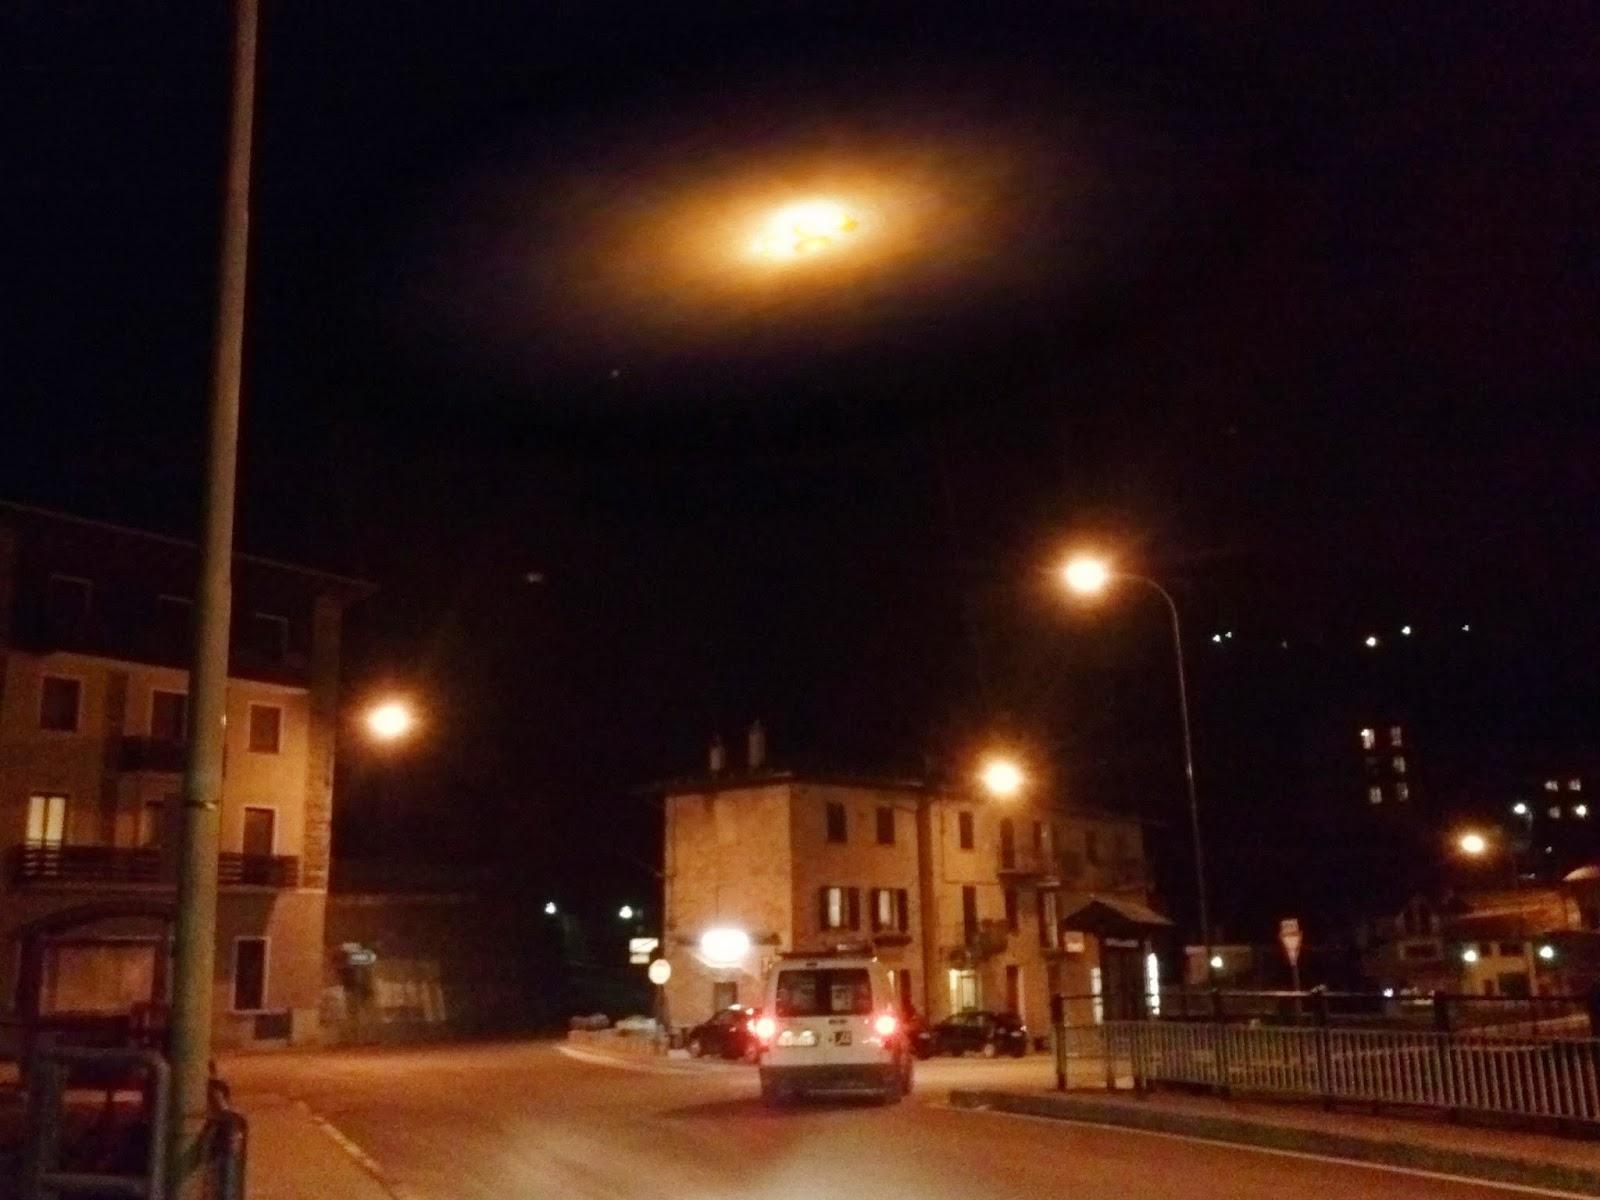 Lampade Cinesi Volanti: Lanterna volante compra su twenga !. 20 pz ...